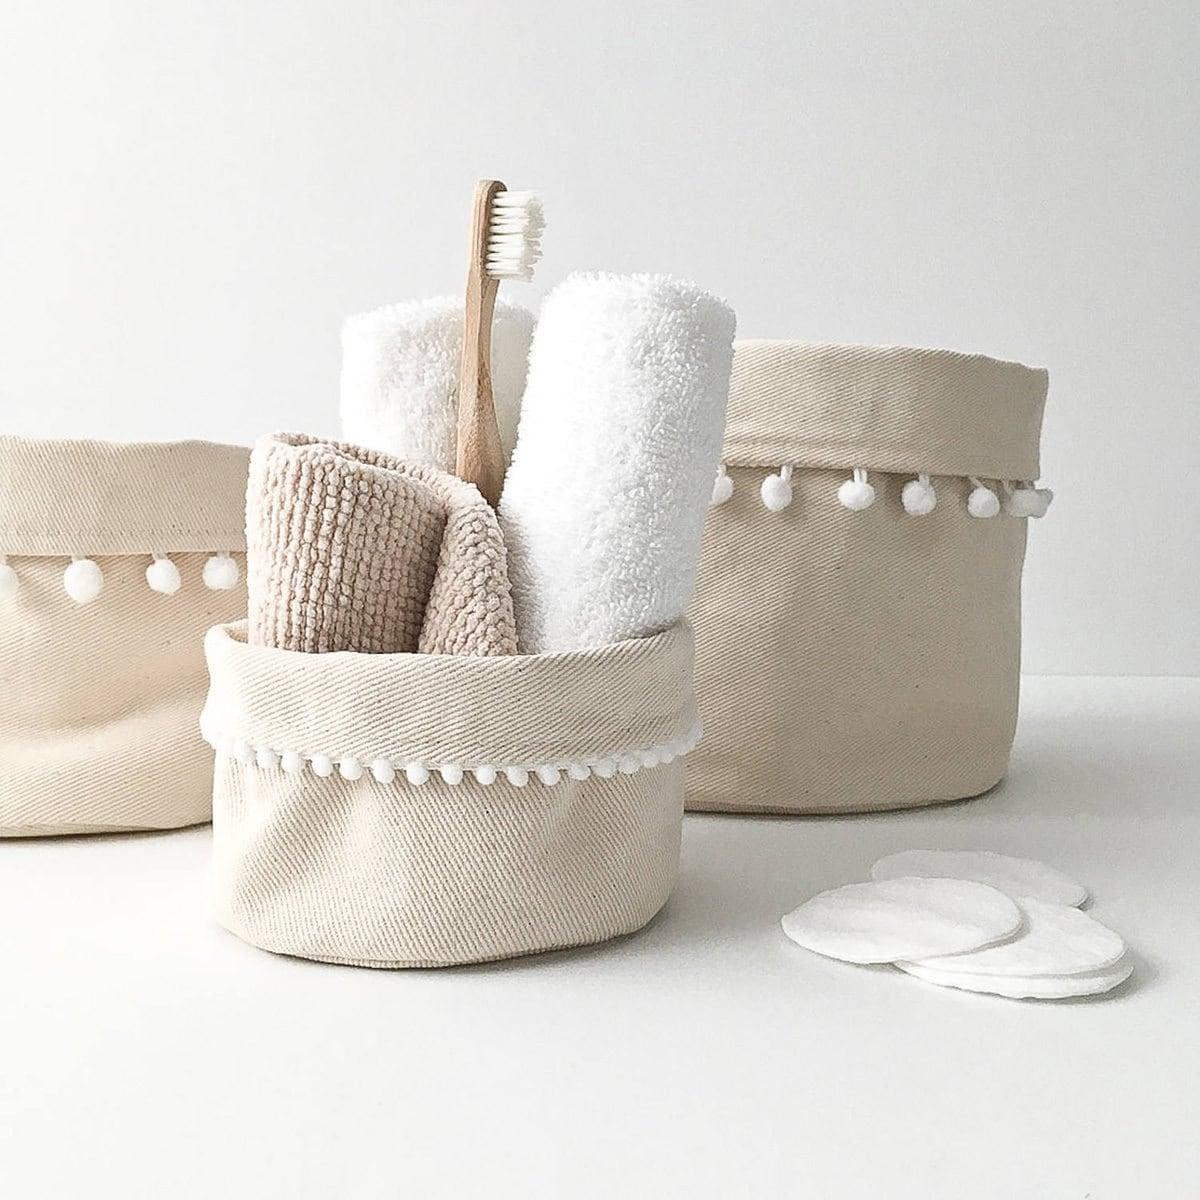 Storage baskets from Etsy